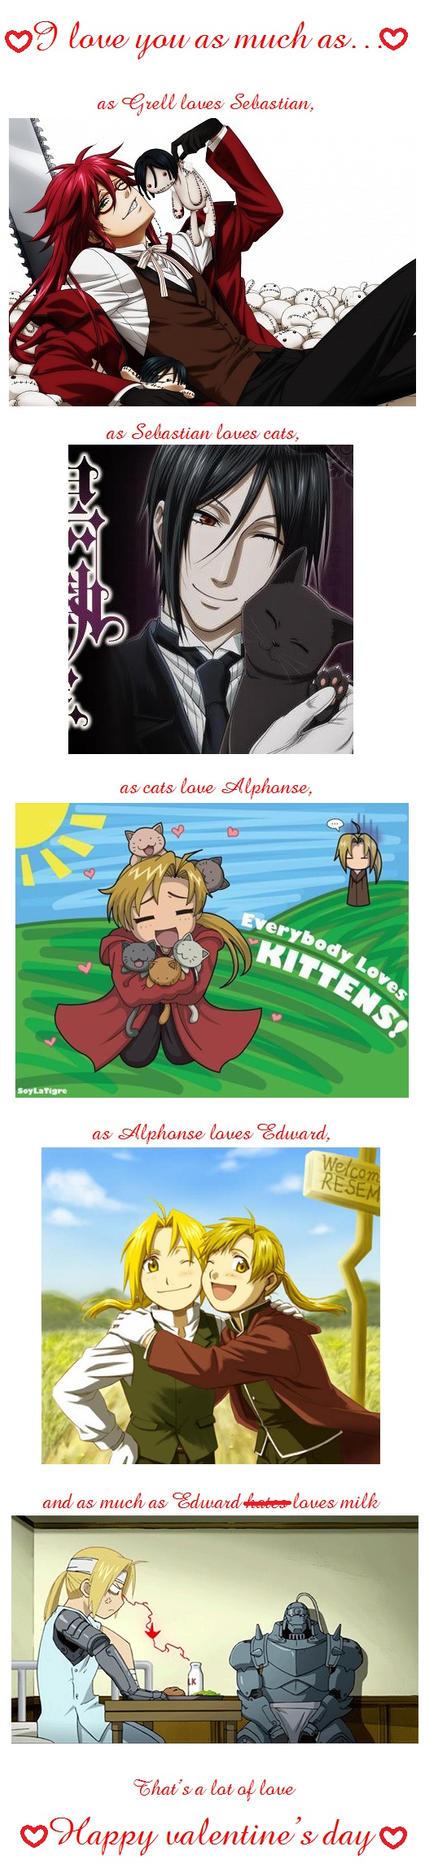 Anime valentine's by SexyAussieKirkland